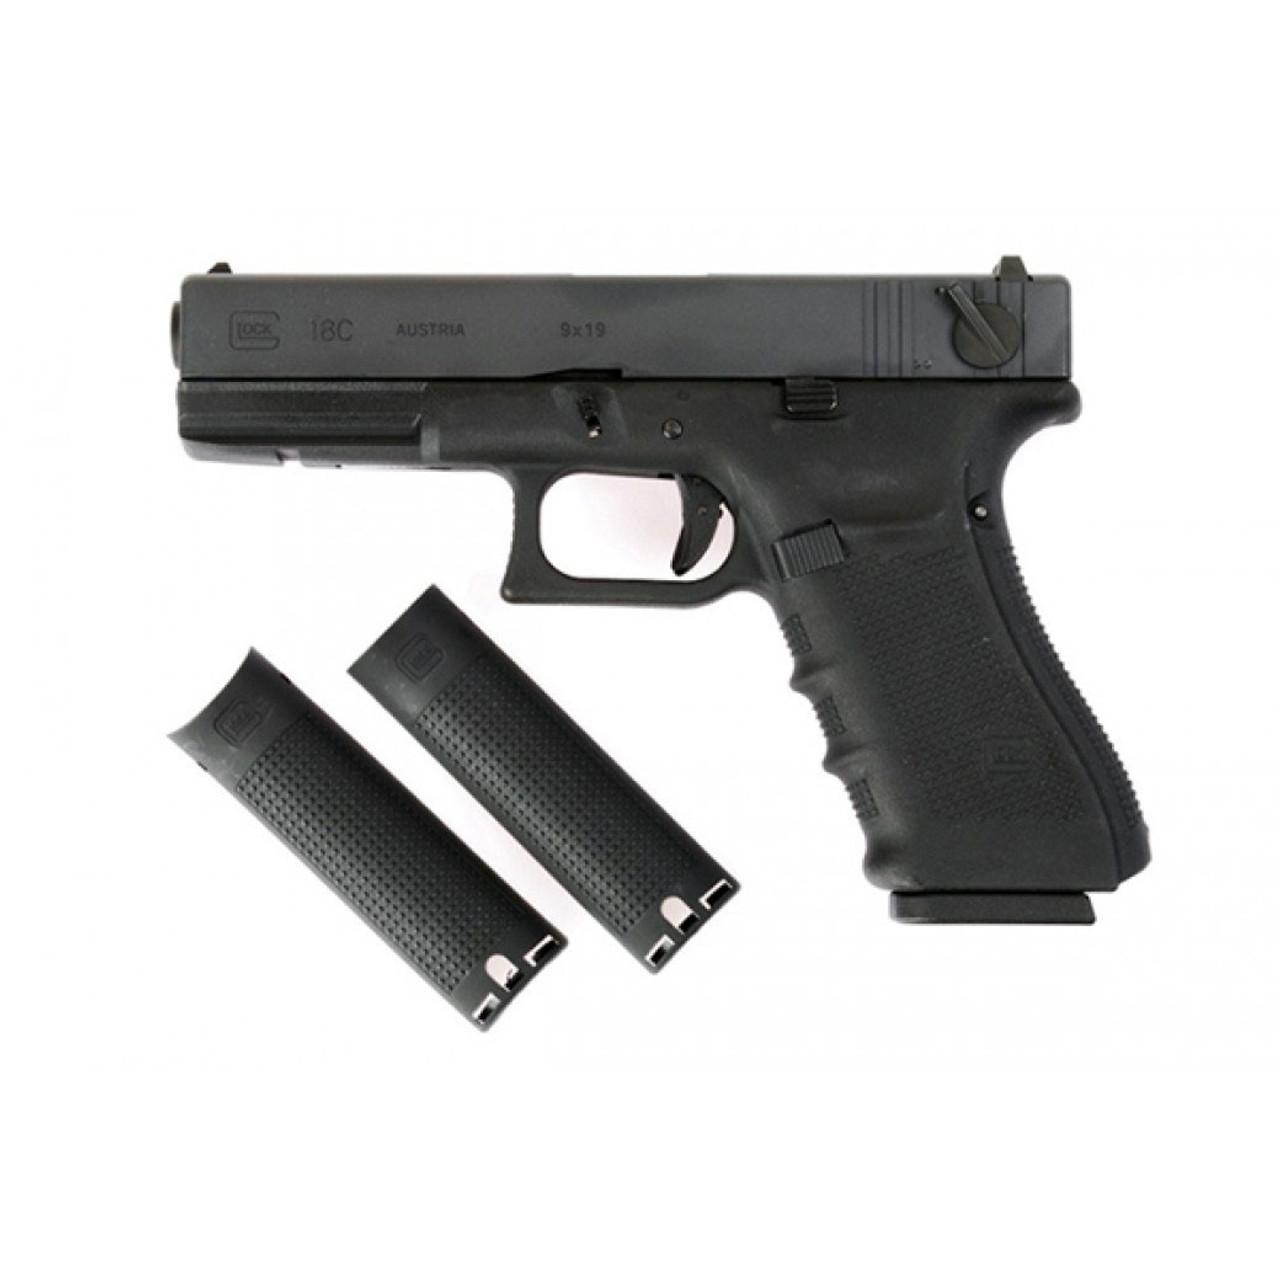 WE EU18 Gen 4 GBB Pistol - Black